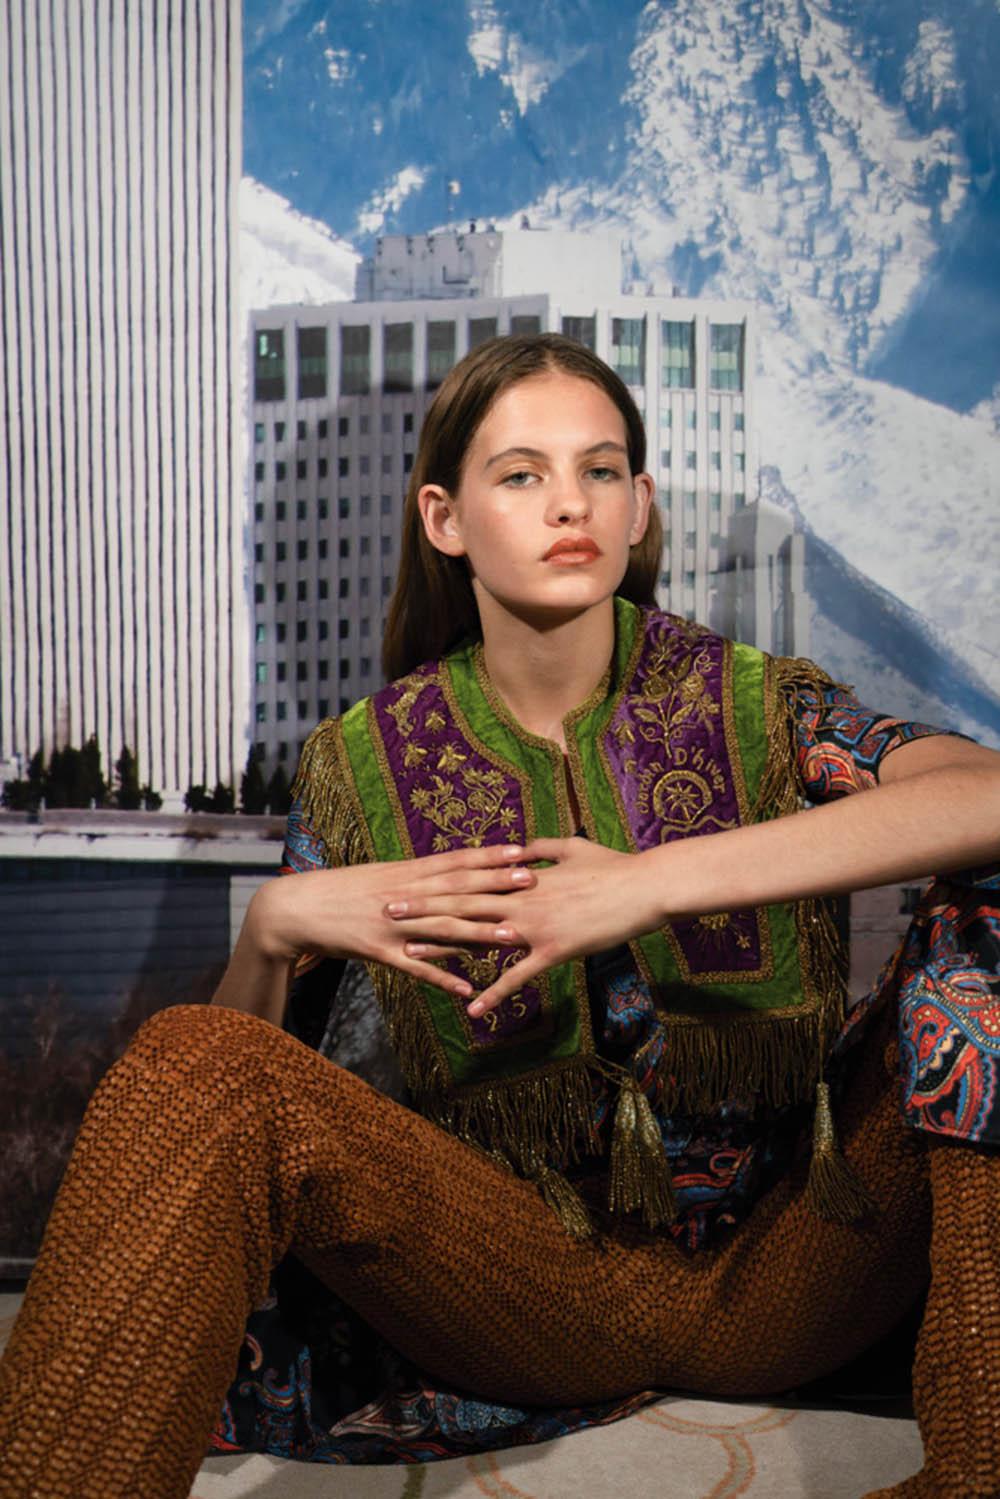 Ansolet Rossouw by Till Janz for Vogue Ukraine February 2019 (1).jpg